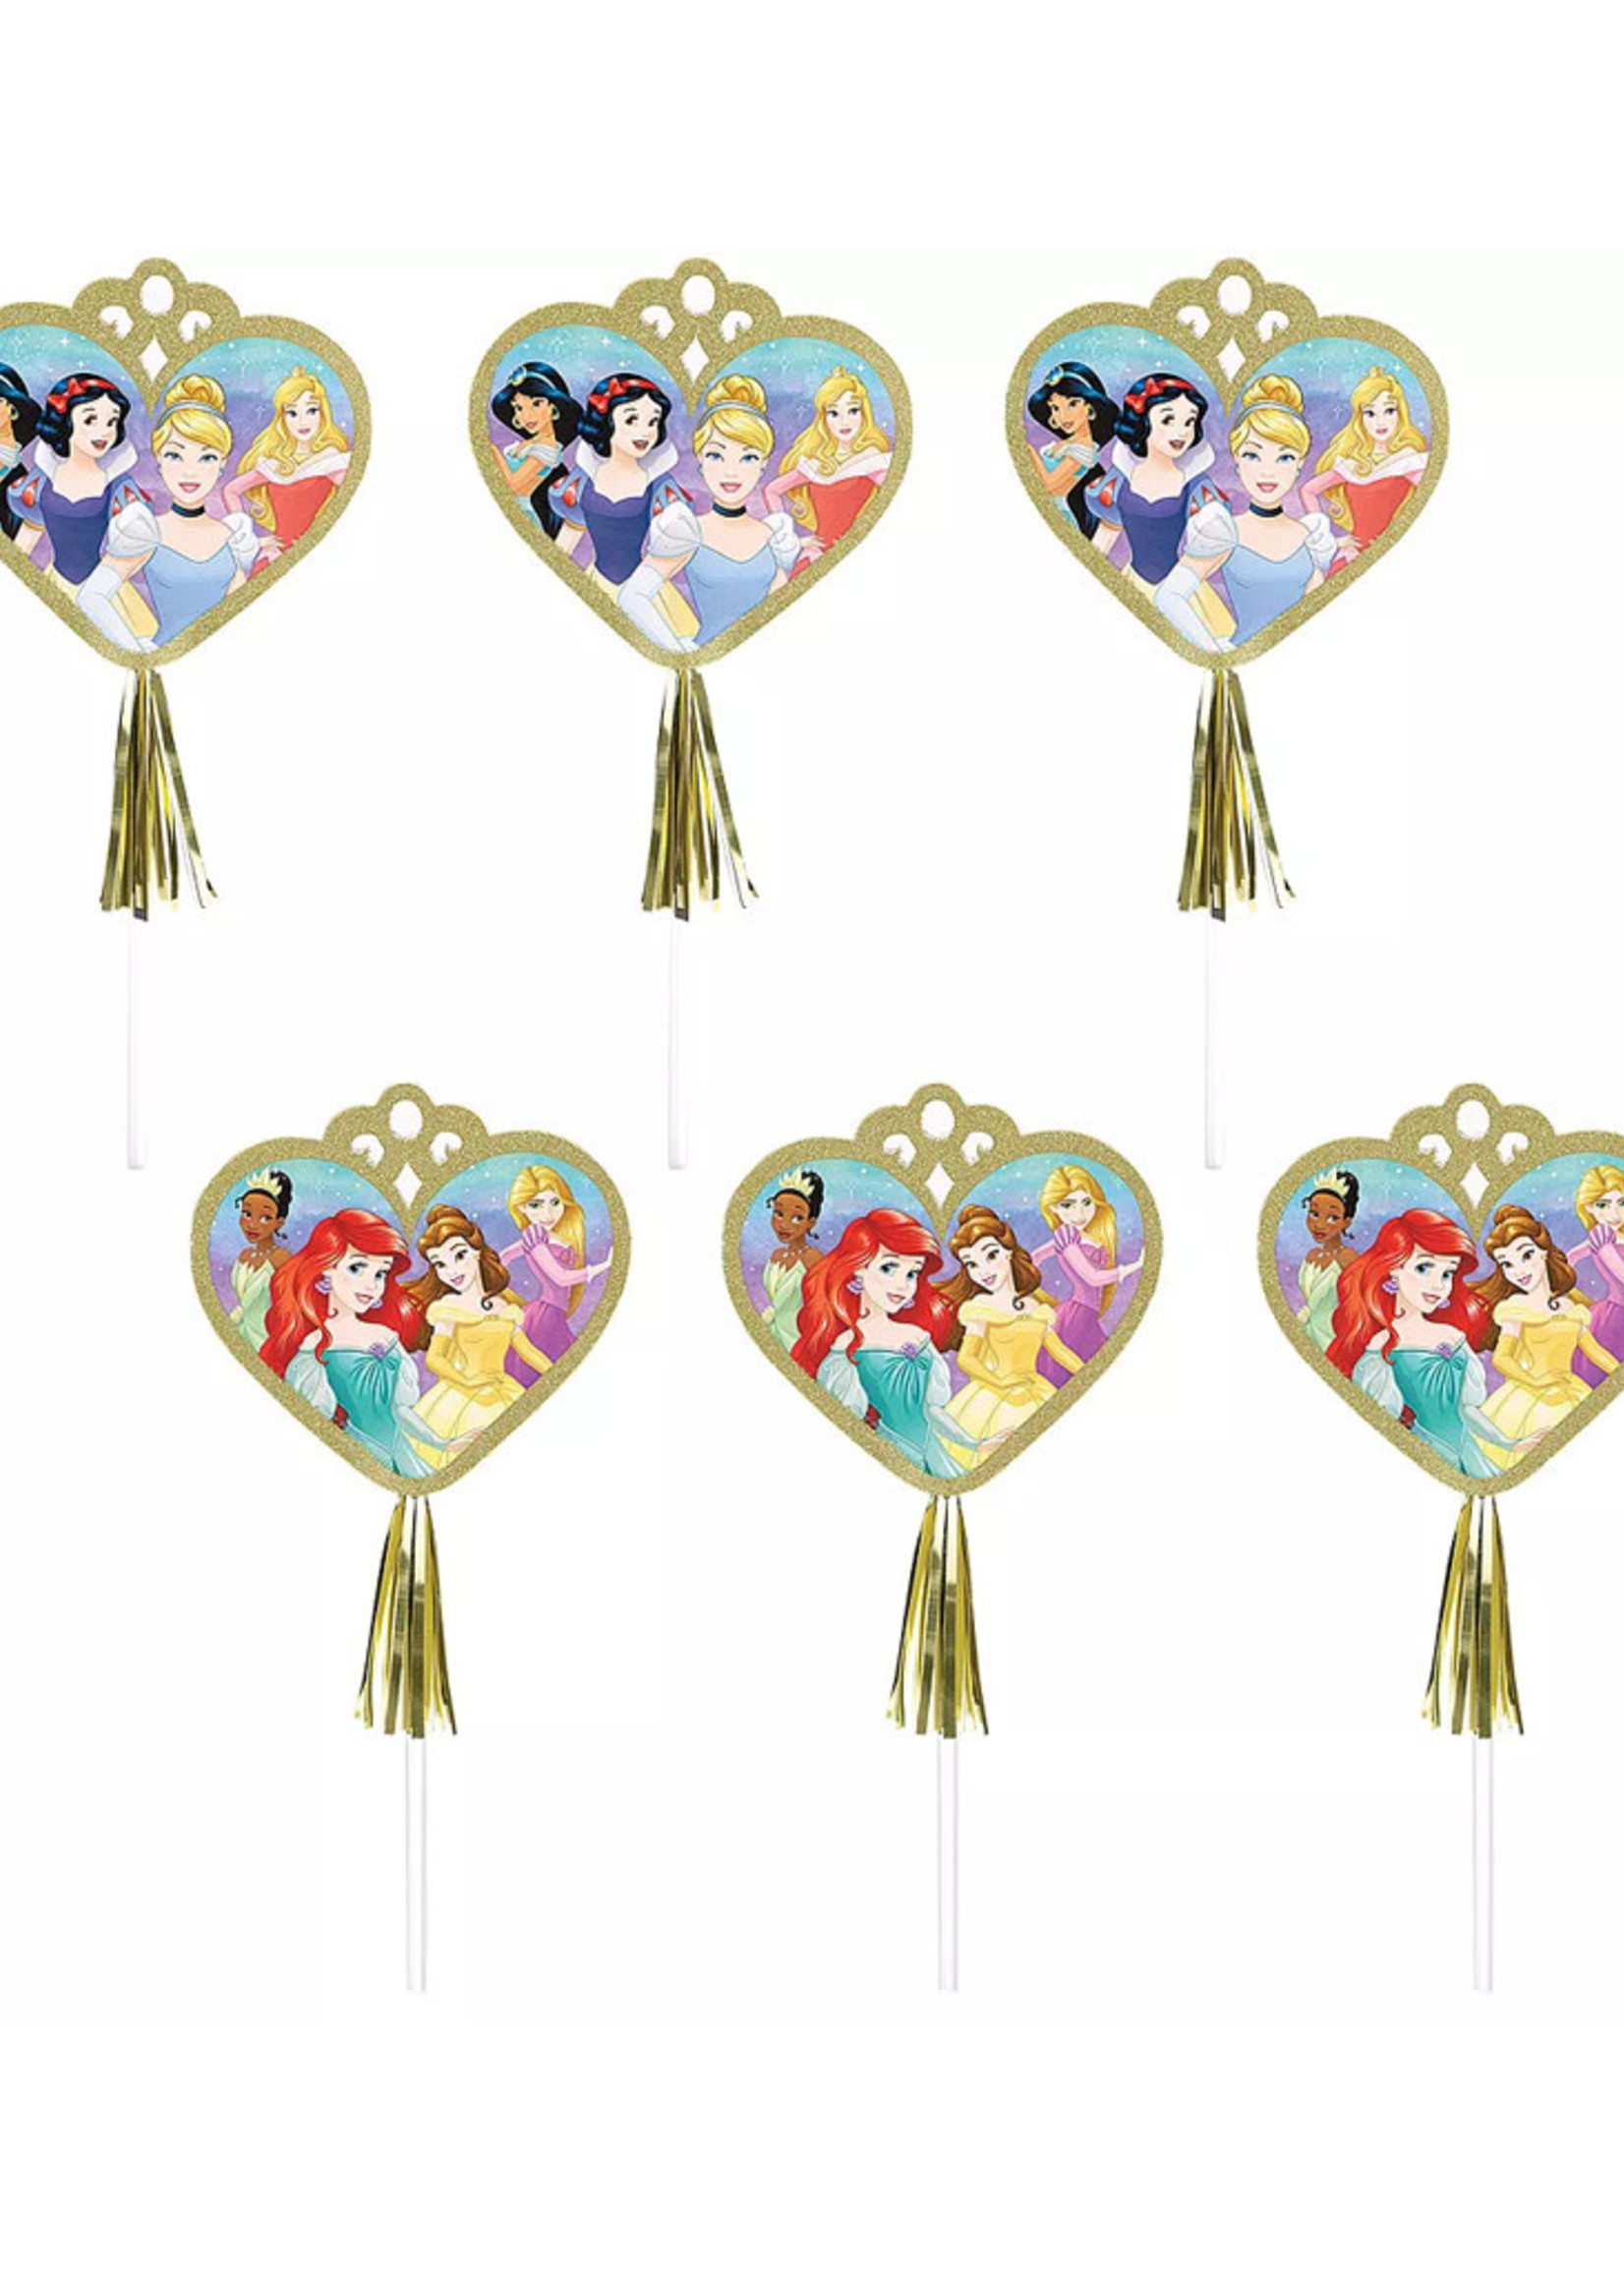 Disney Princess Once Upon a Time Wands 8ct